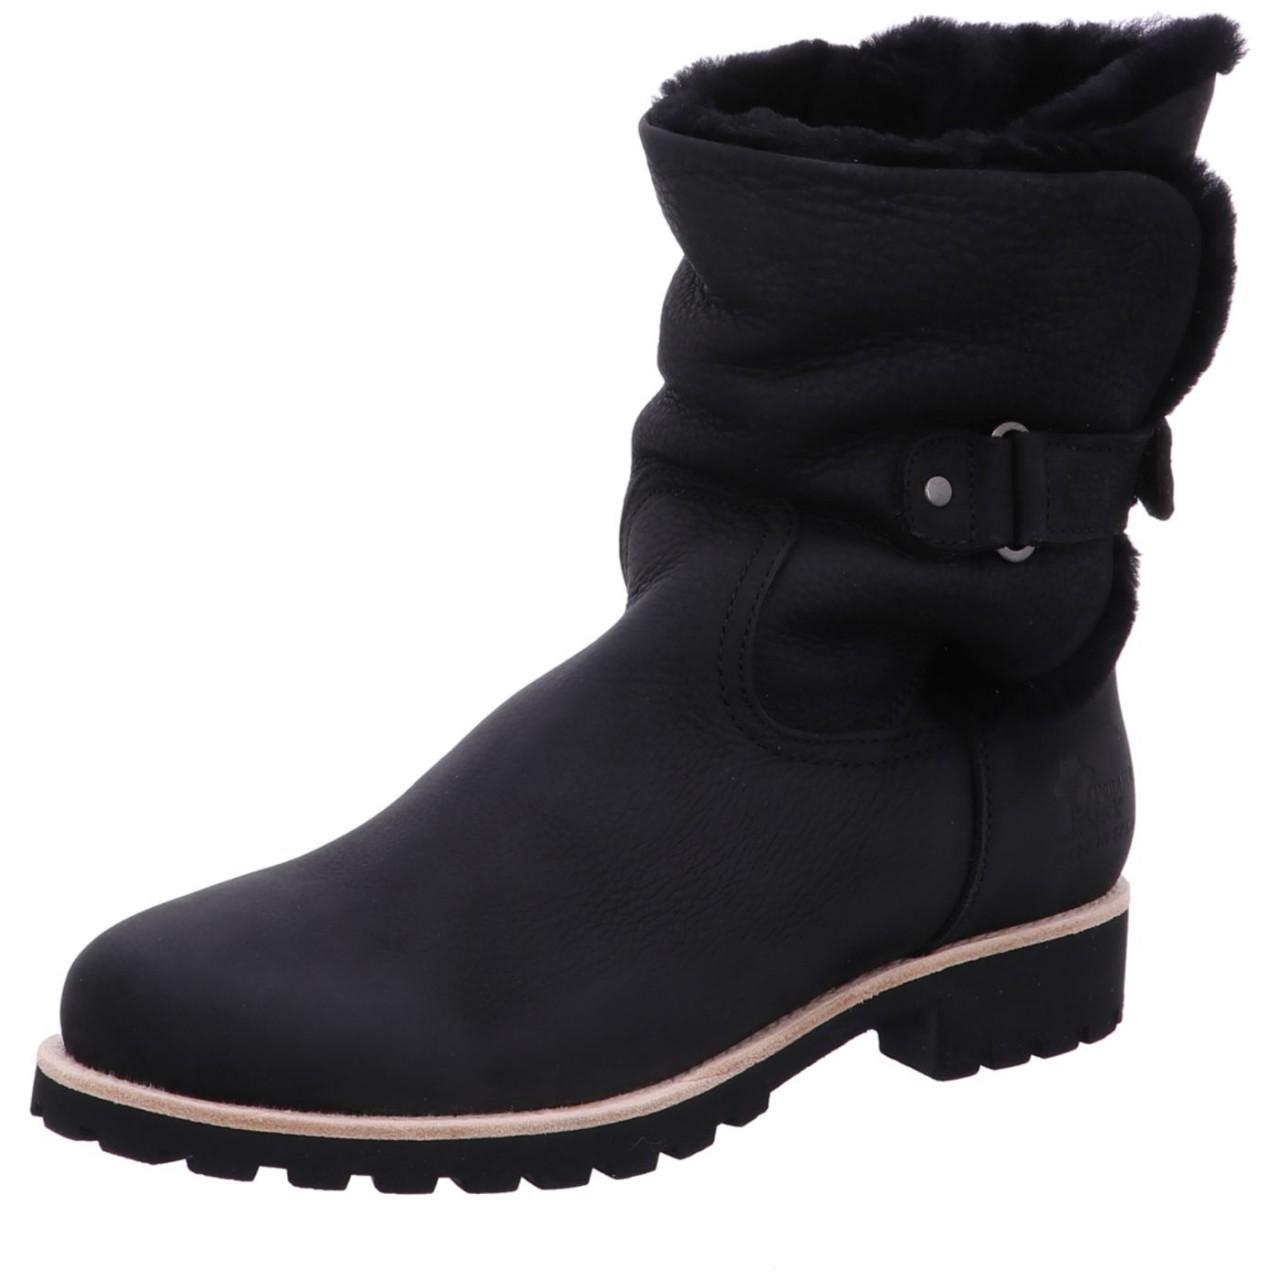 Panama Jack Boot Felia Igloo B16 Schwarz Felia Igloo B16 black